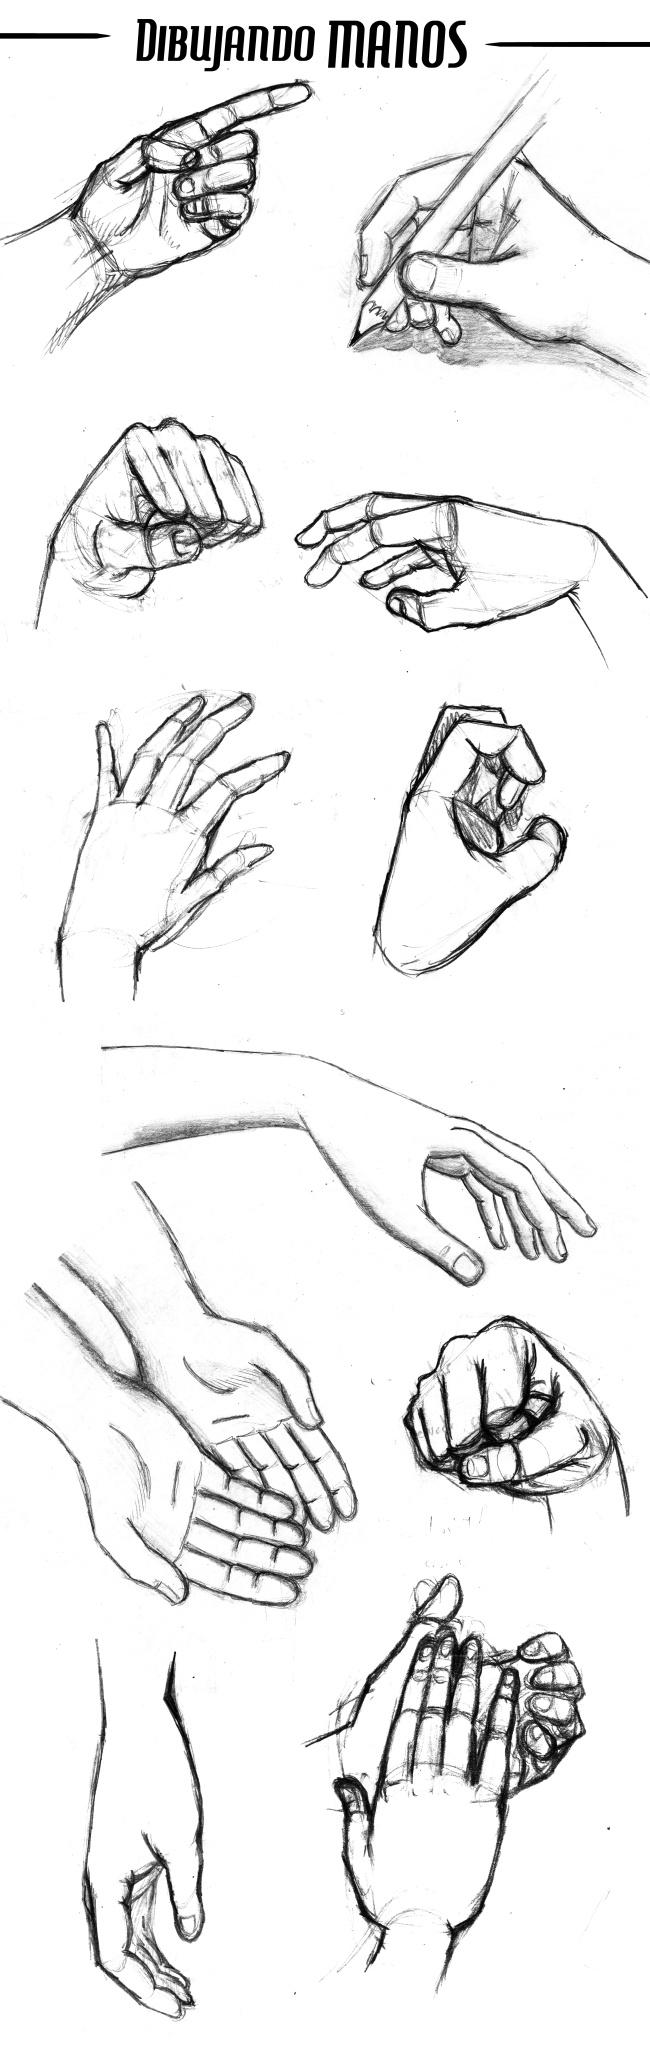 trabajos-alumnos-comic-sabados-dibujar-manos-anatomia-academiac10-madrid